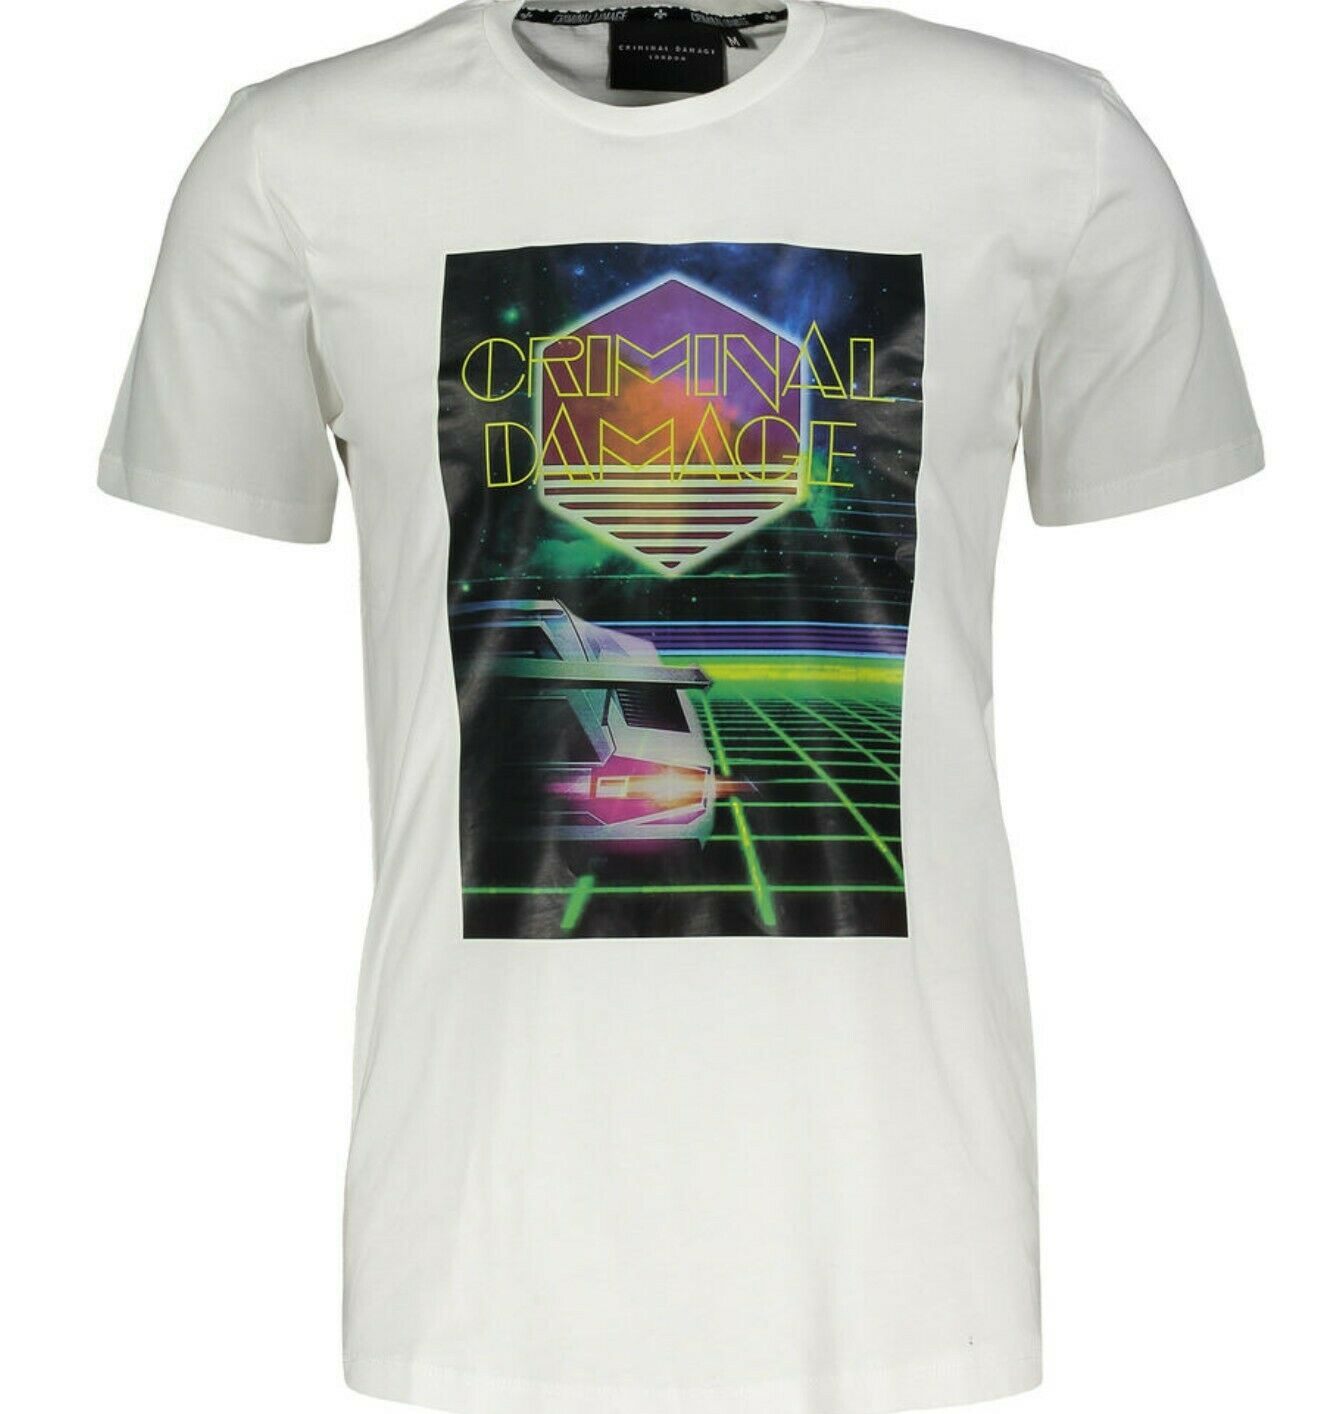 CRIMINAL DAMAGE Men's Speed Digital Graphic Print T-shirt